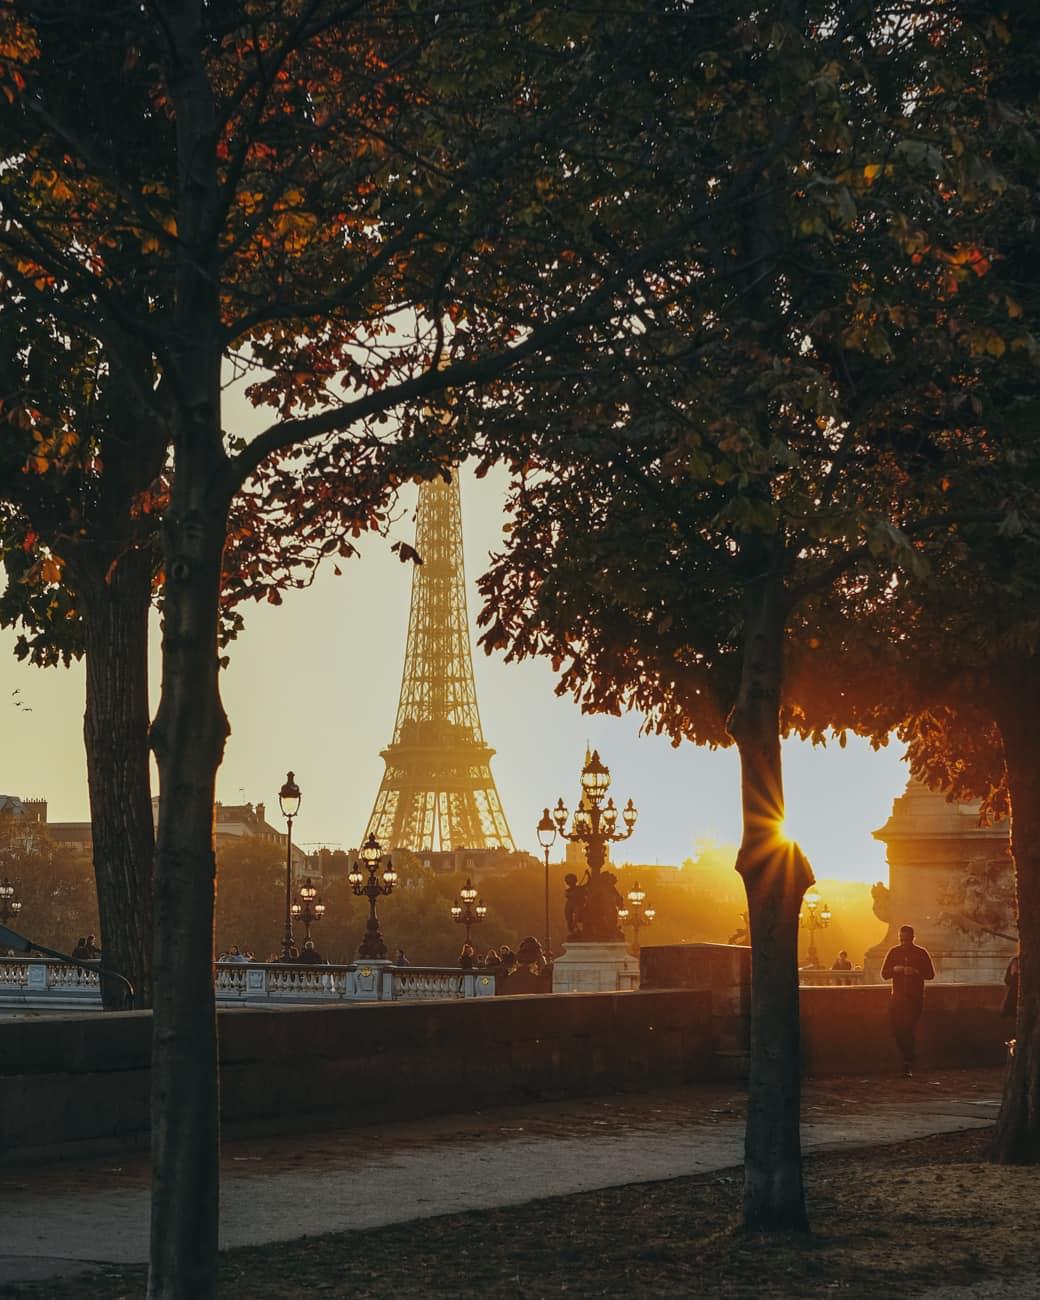 Iron Lady enveloped in gold 🌇 #Paris https://t.co/3yUn85Z76s